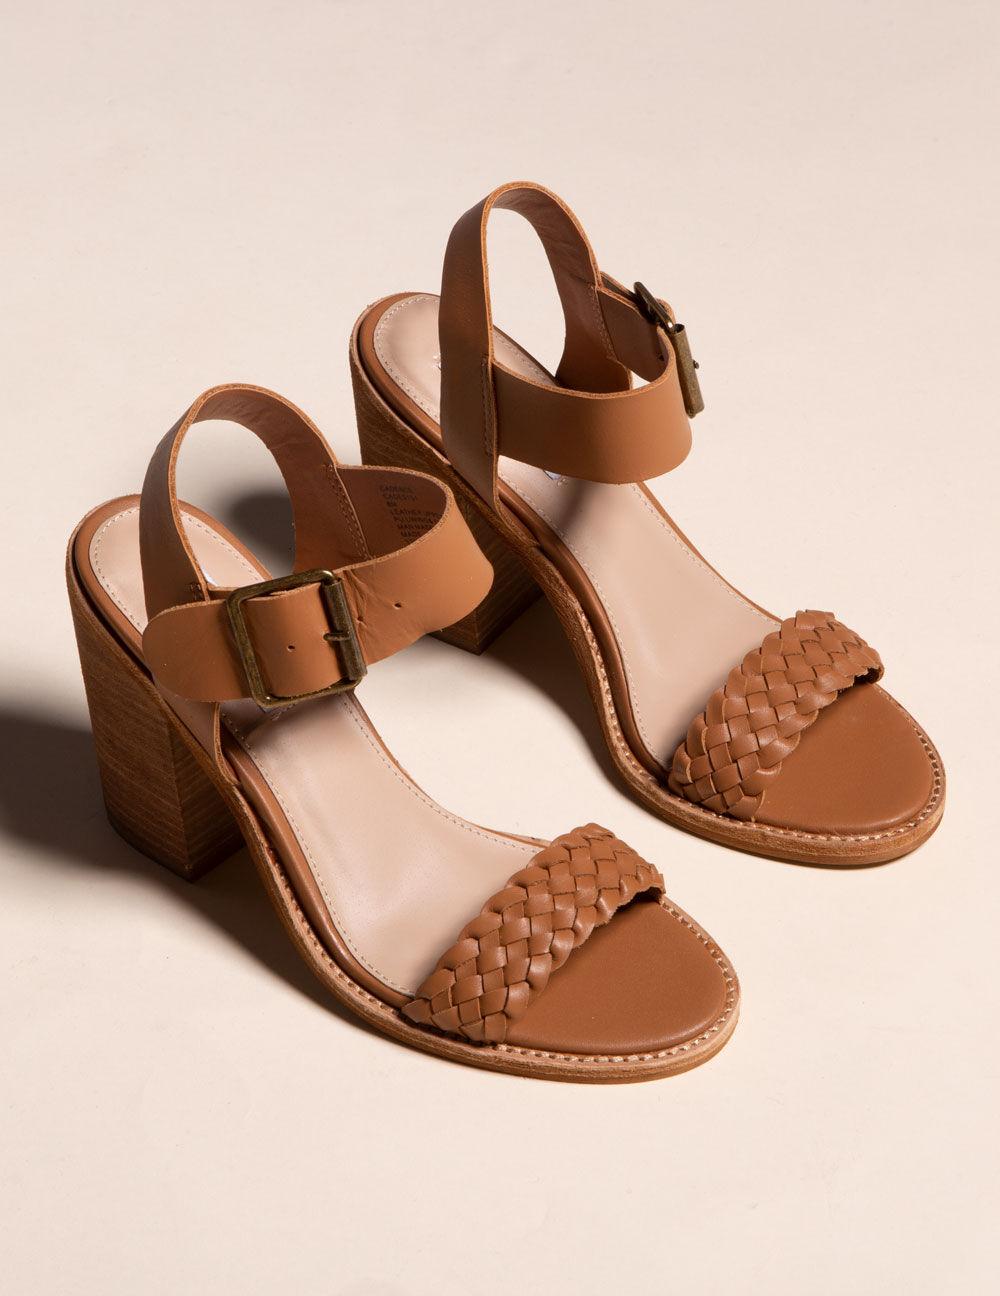 STEVE MADDEN Cadence Cognac Leather Heeled Sandals